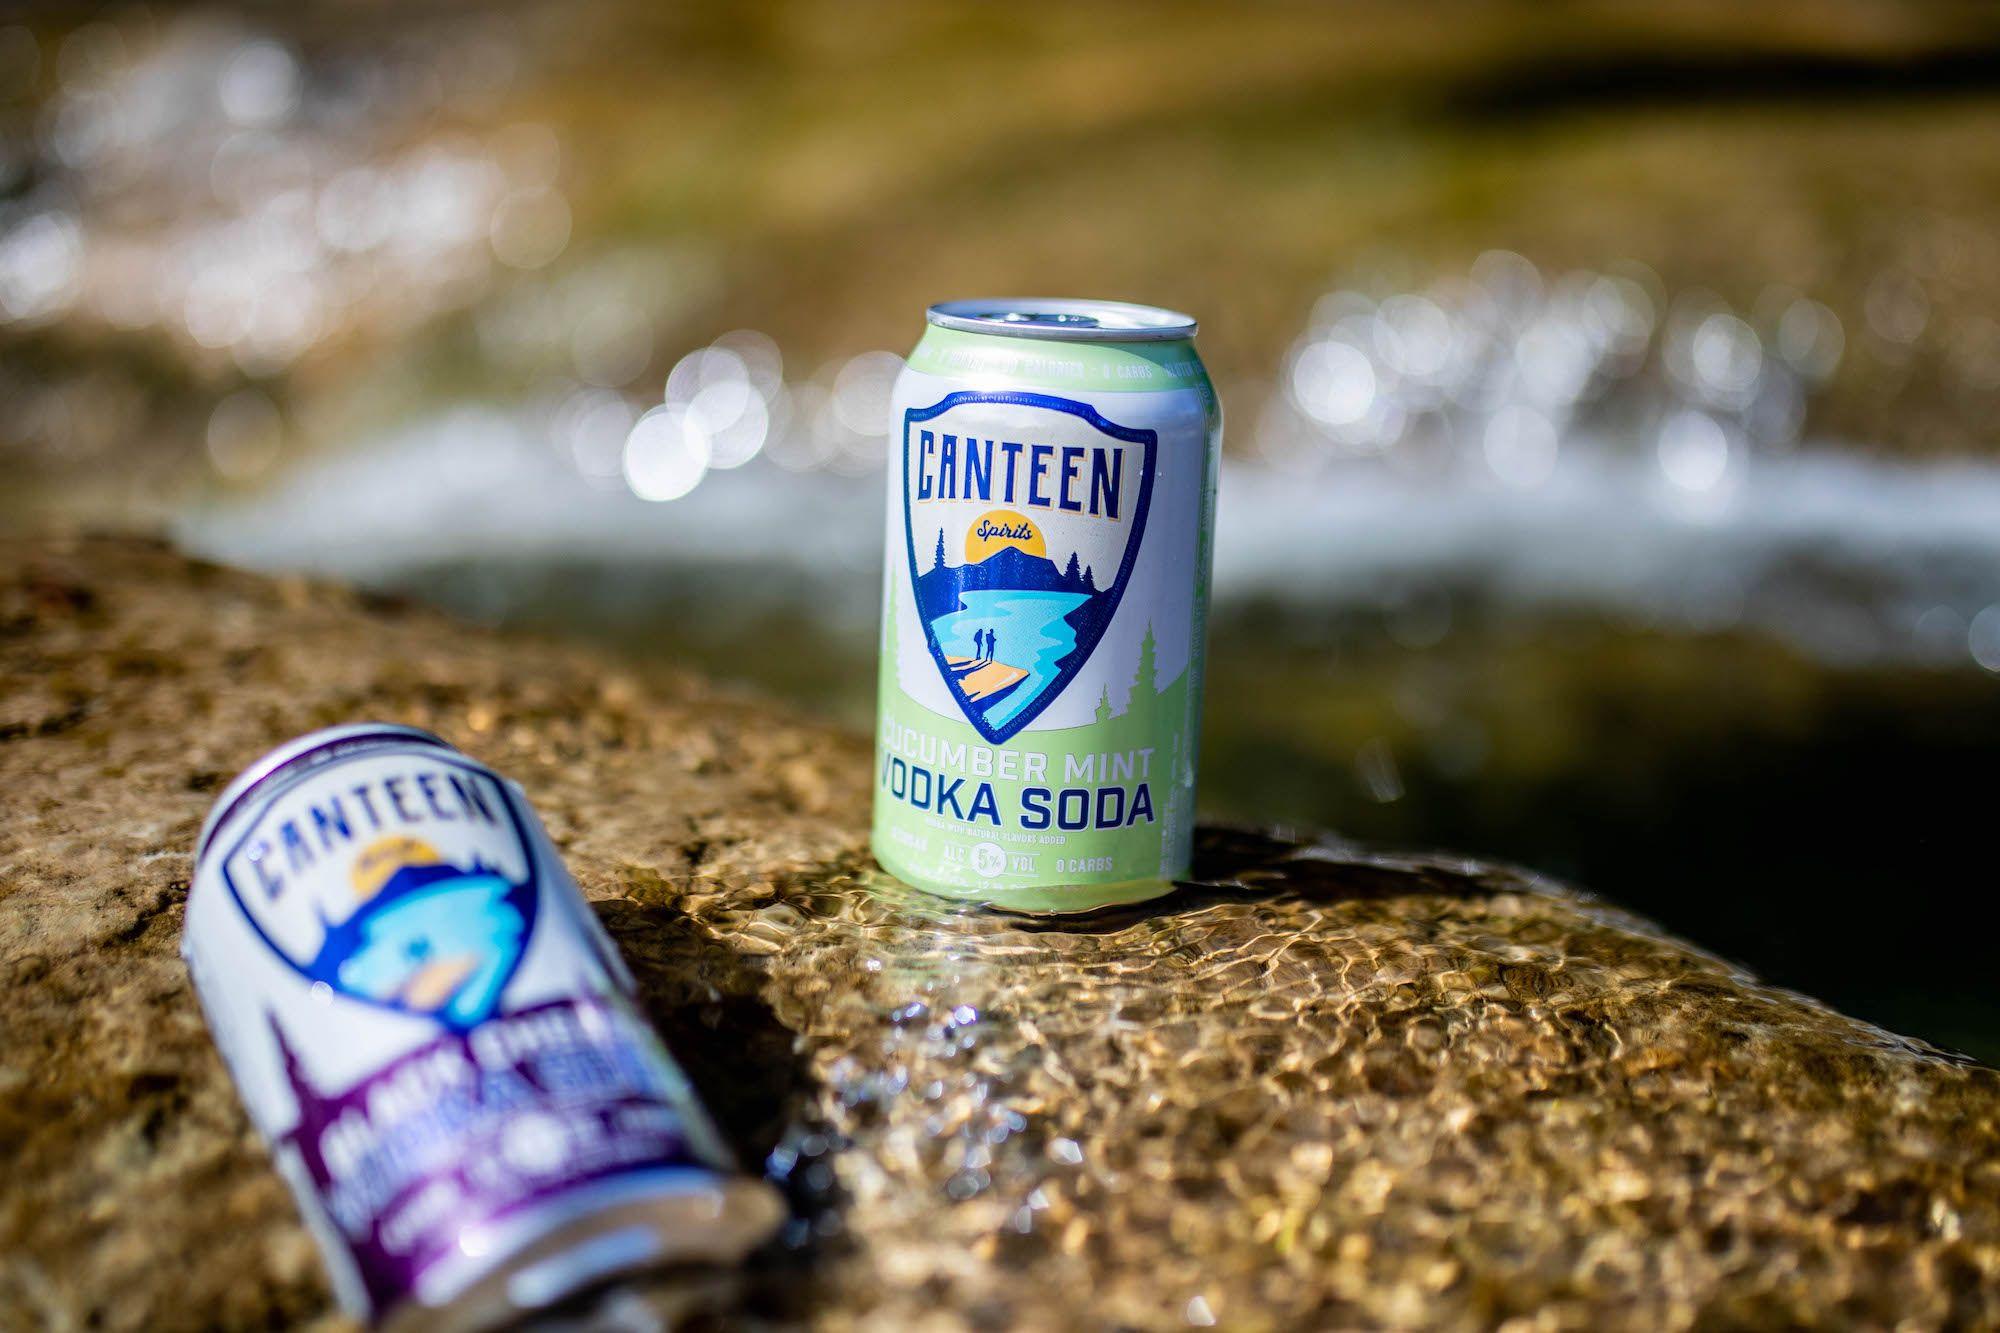 Canteen Sparkling Vodka Soda Now Available Nationwide Beeralien In 2020 Vodka Soda Vodka Malt Beer